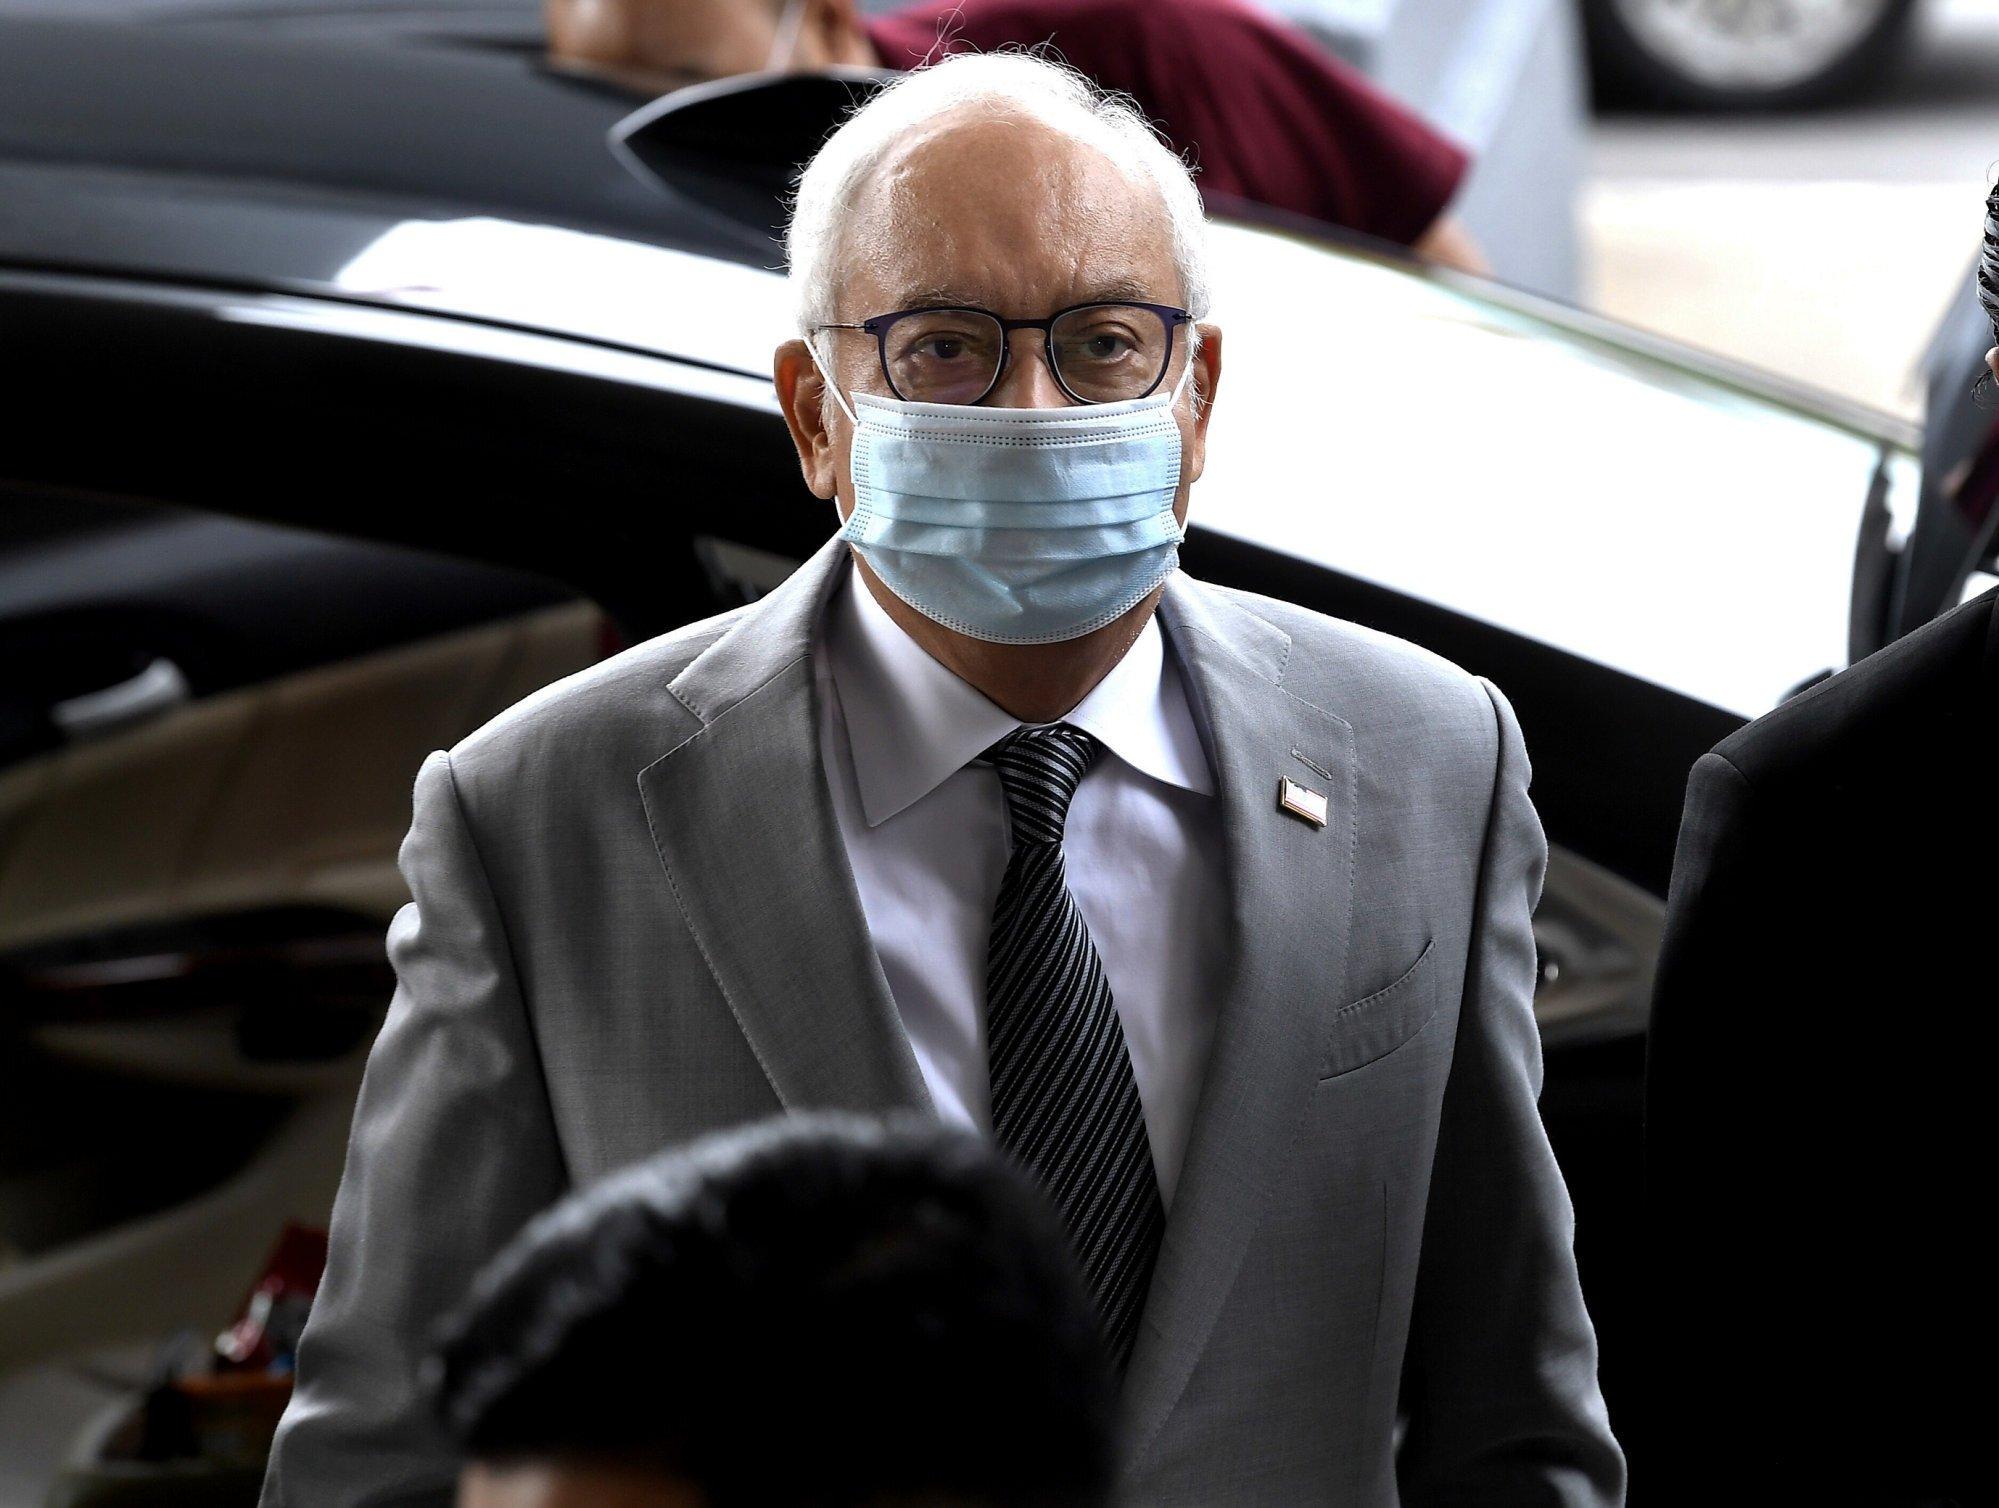 Najib Razak arrives at Kuala Lumpur High Court for a 1MDB trial in May. Photo: DPA